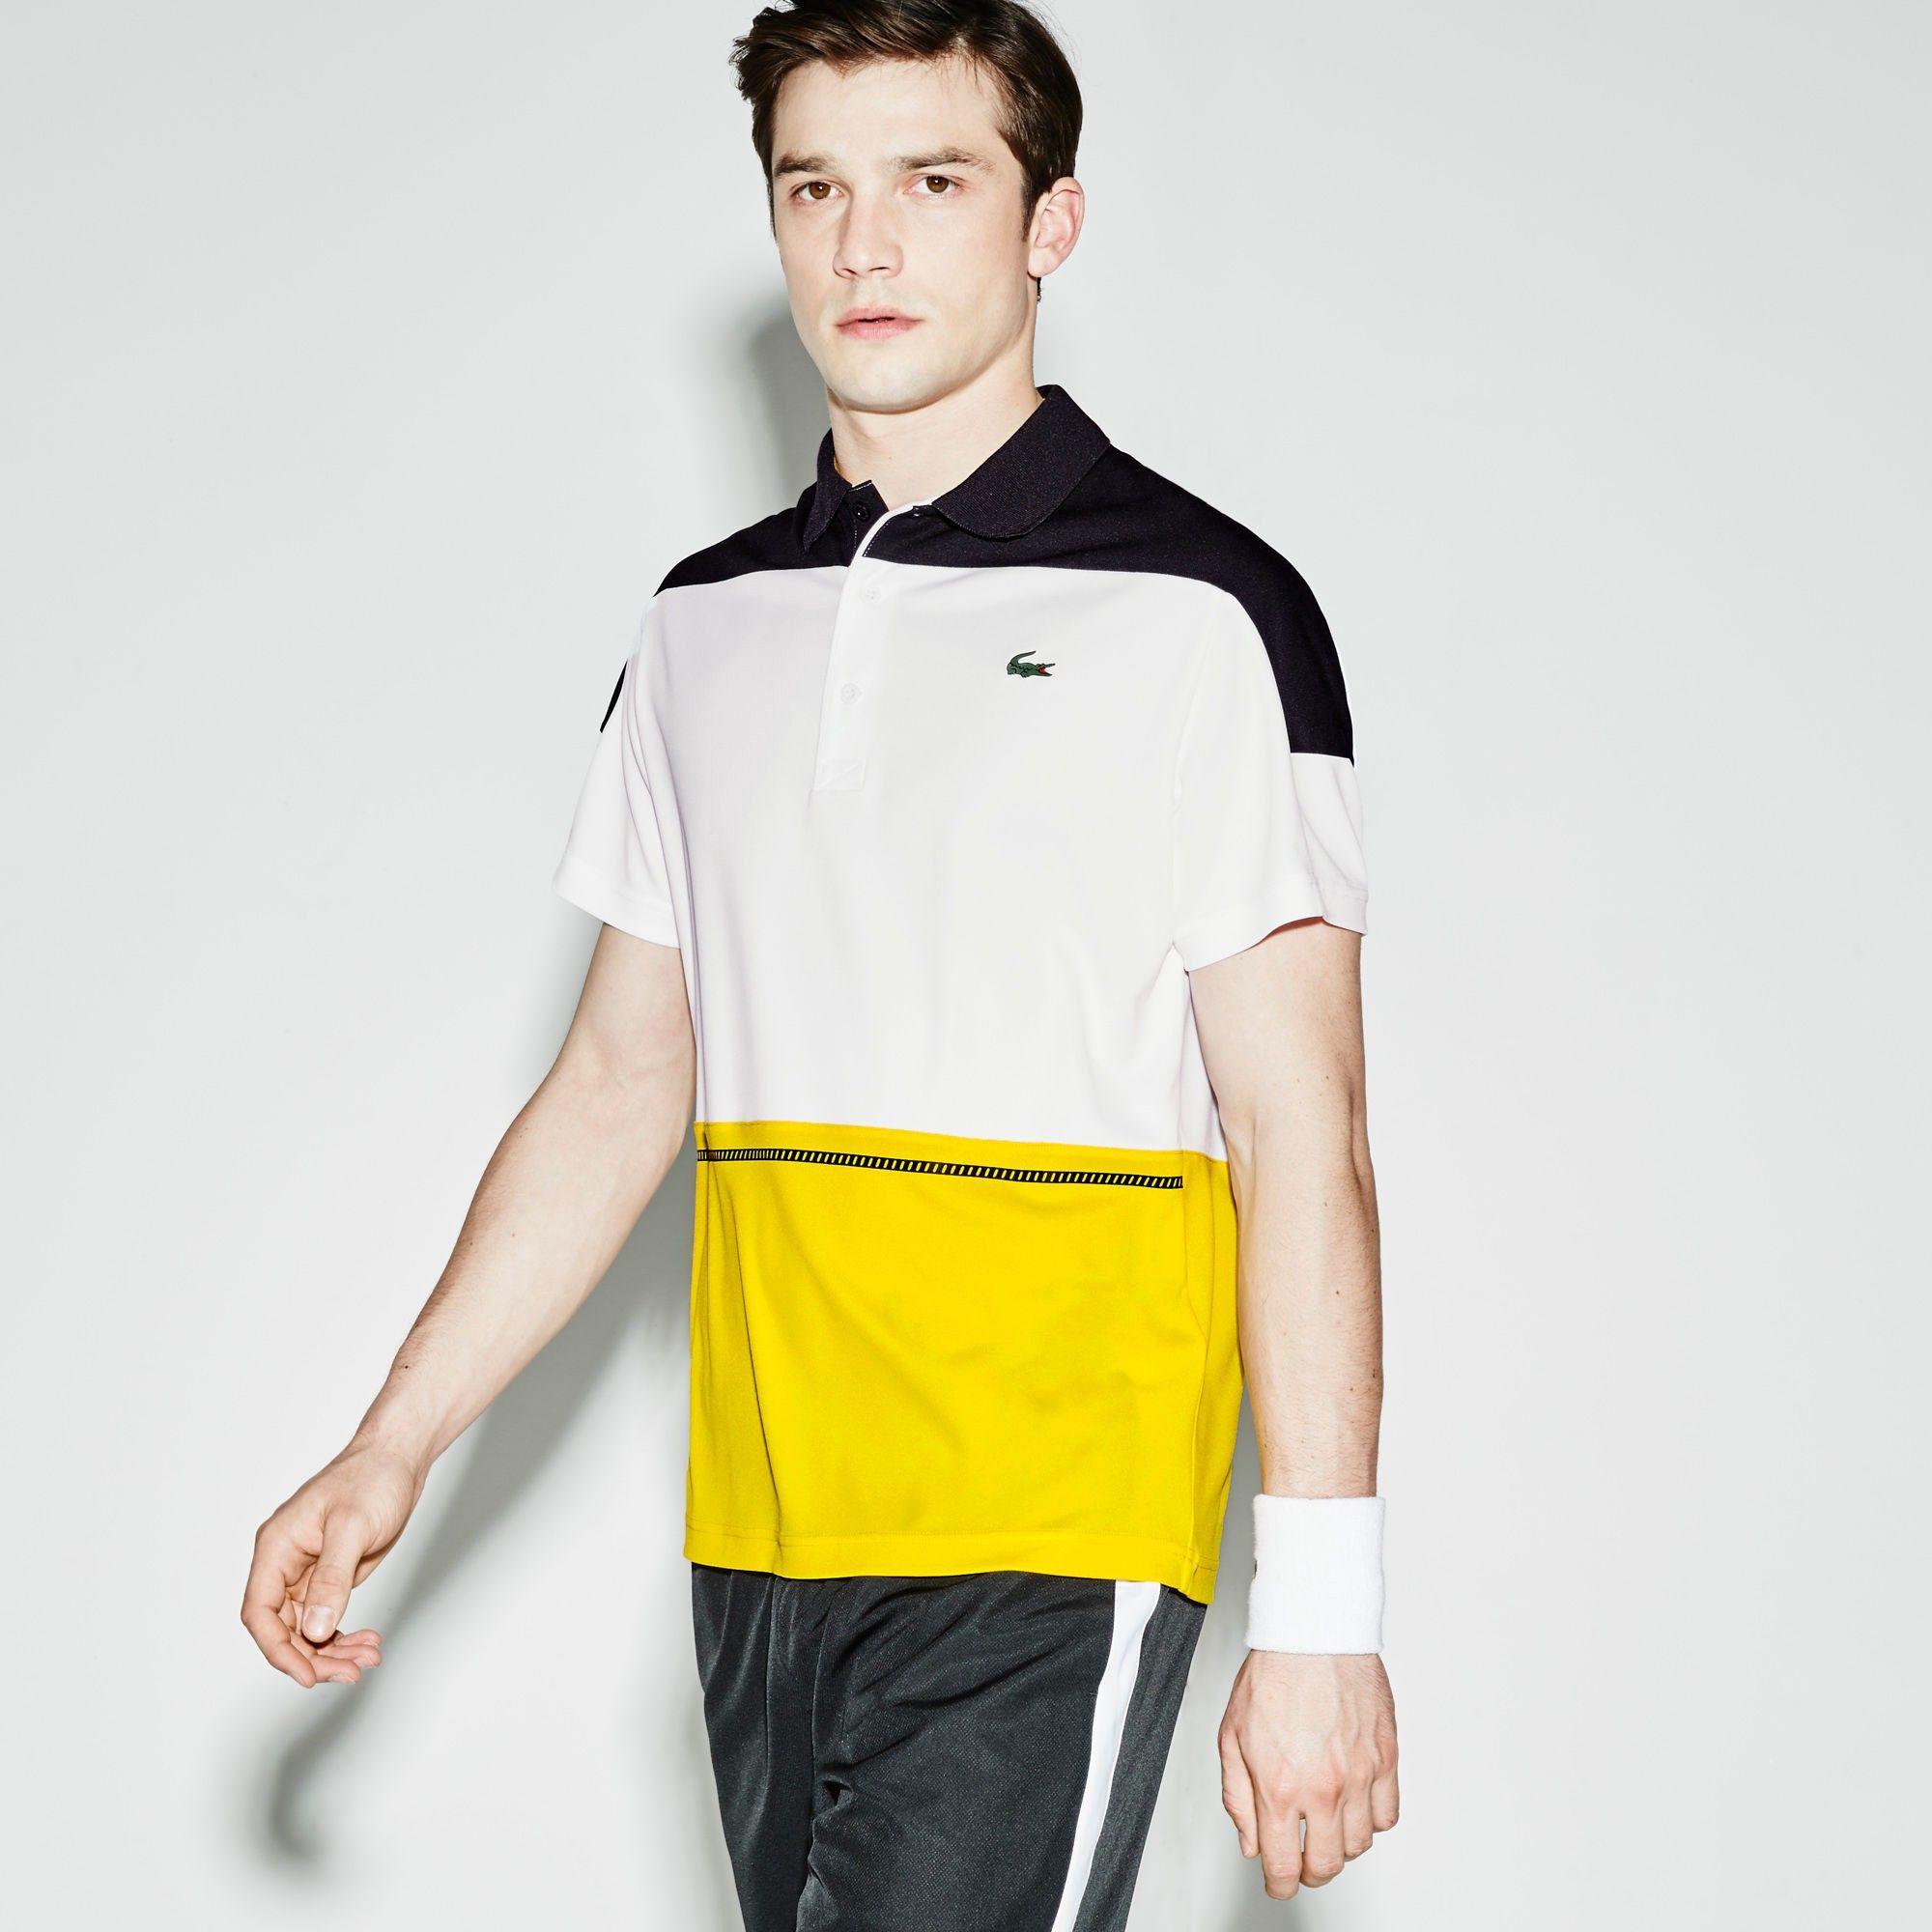 Lacoste Men S Sport Ultra Dry Color Block Tennis Polo Shirt Black White Jonquille Modesens Polo Shirt Outfit Women S Shirt Outfit Women Polo Tee Shirts